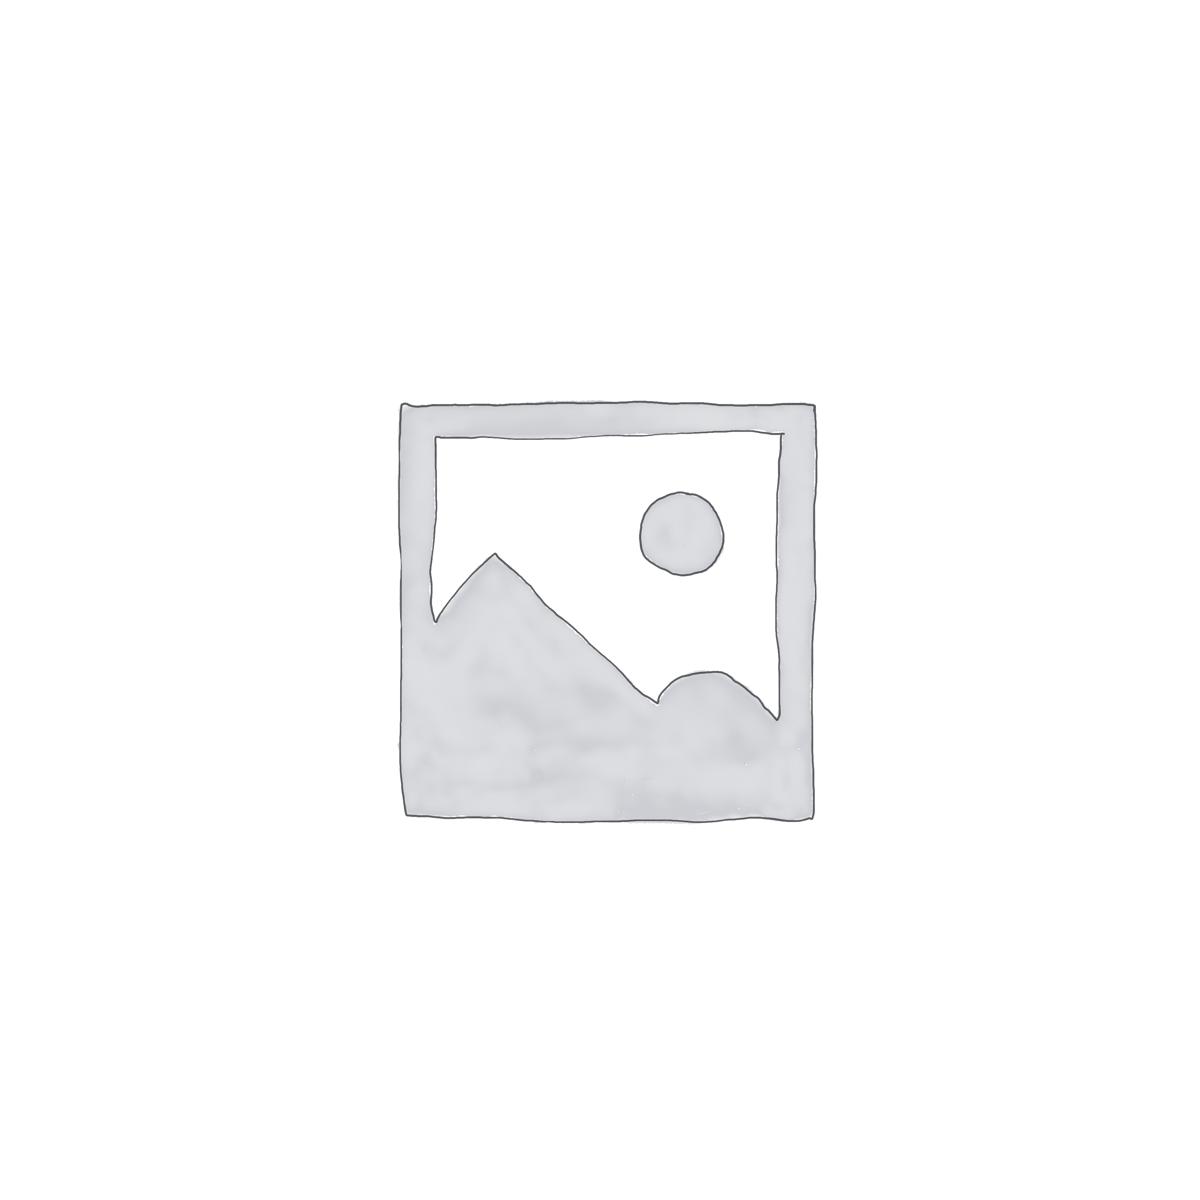 Tropical River Landscape Wallpaper Mural